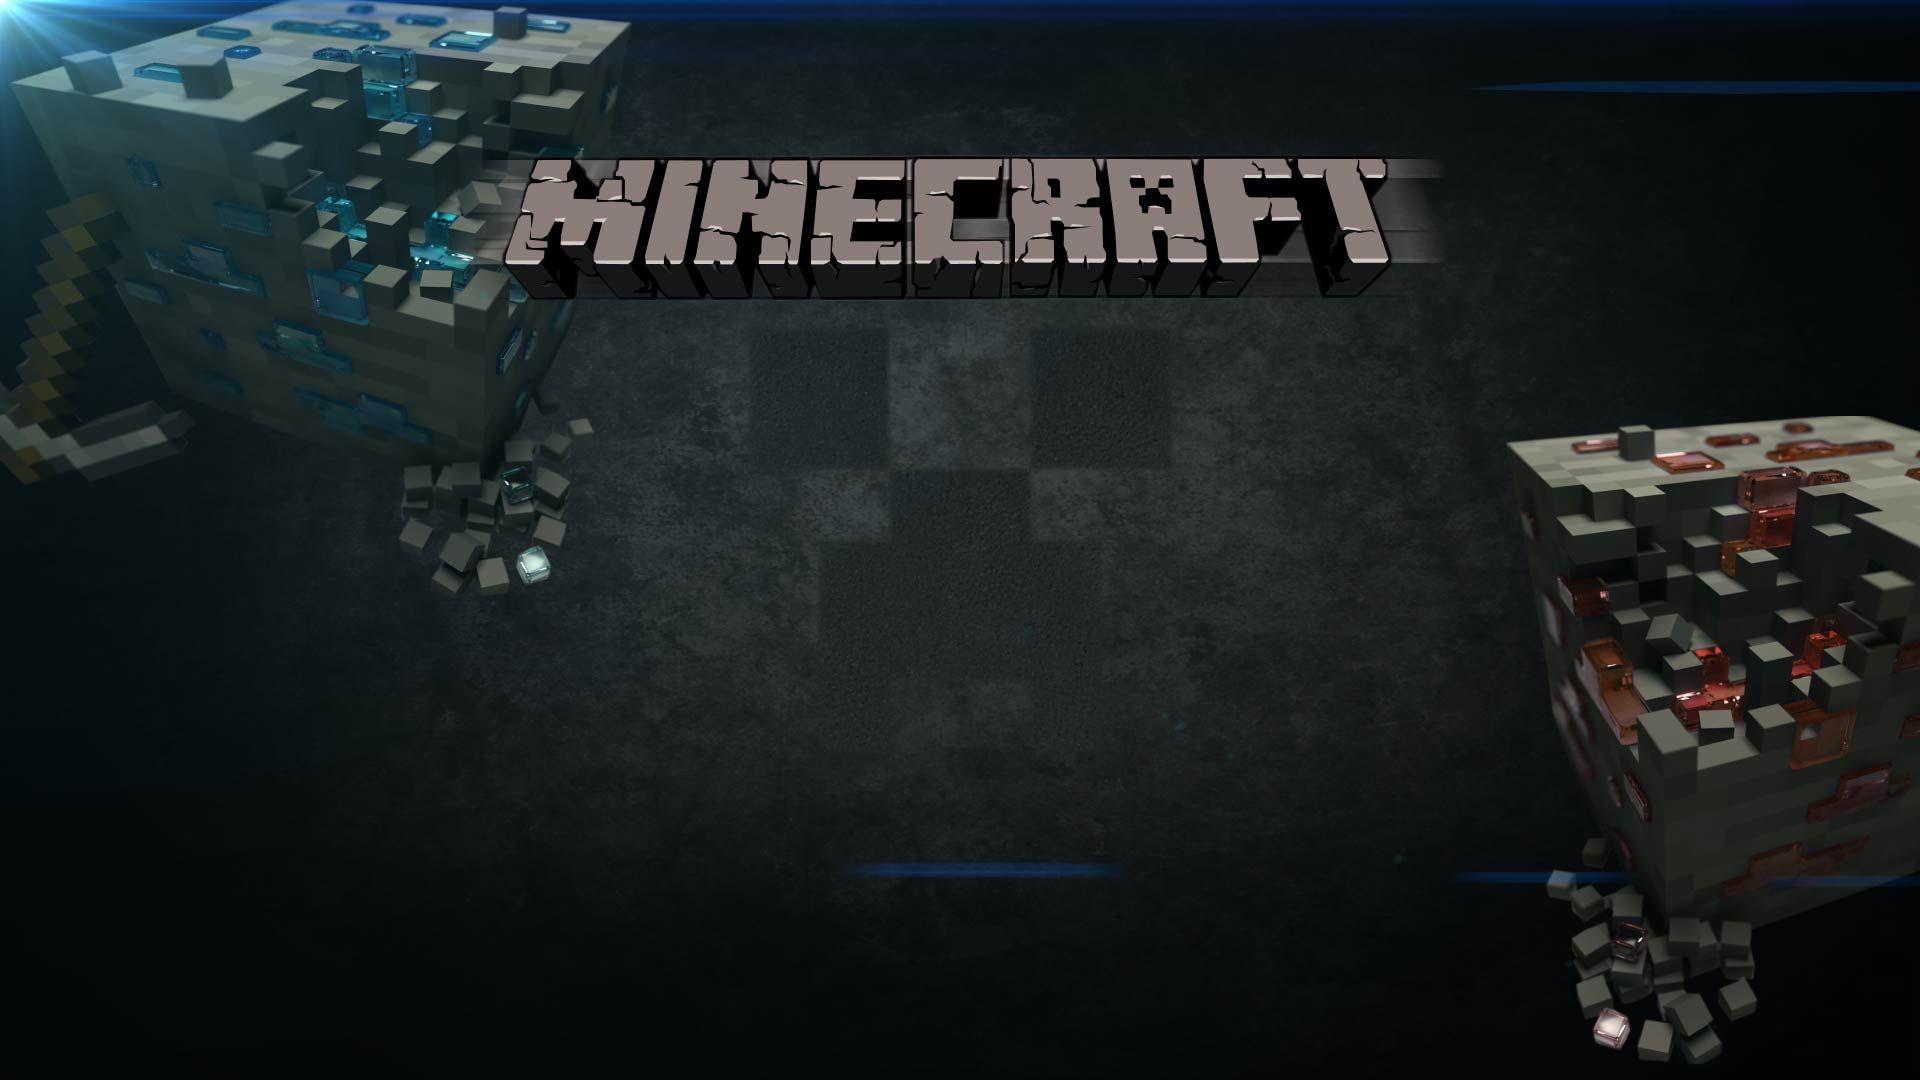 Minecraft Wallpaper 1920 1080 Wallpapers Hd 1080p 41